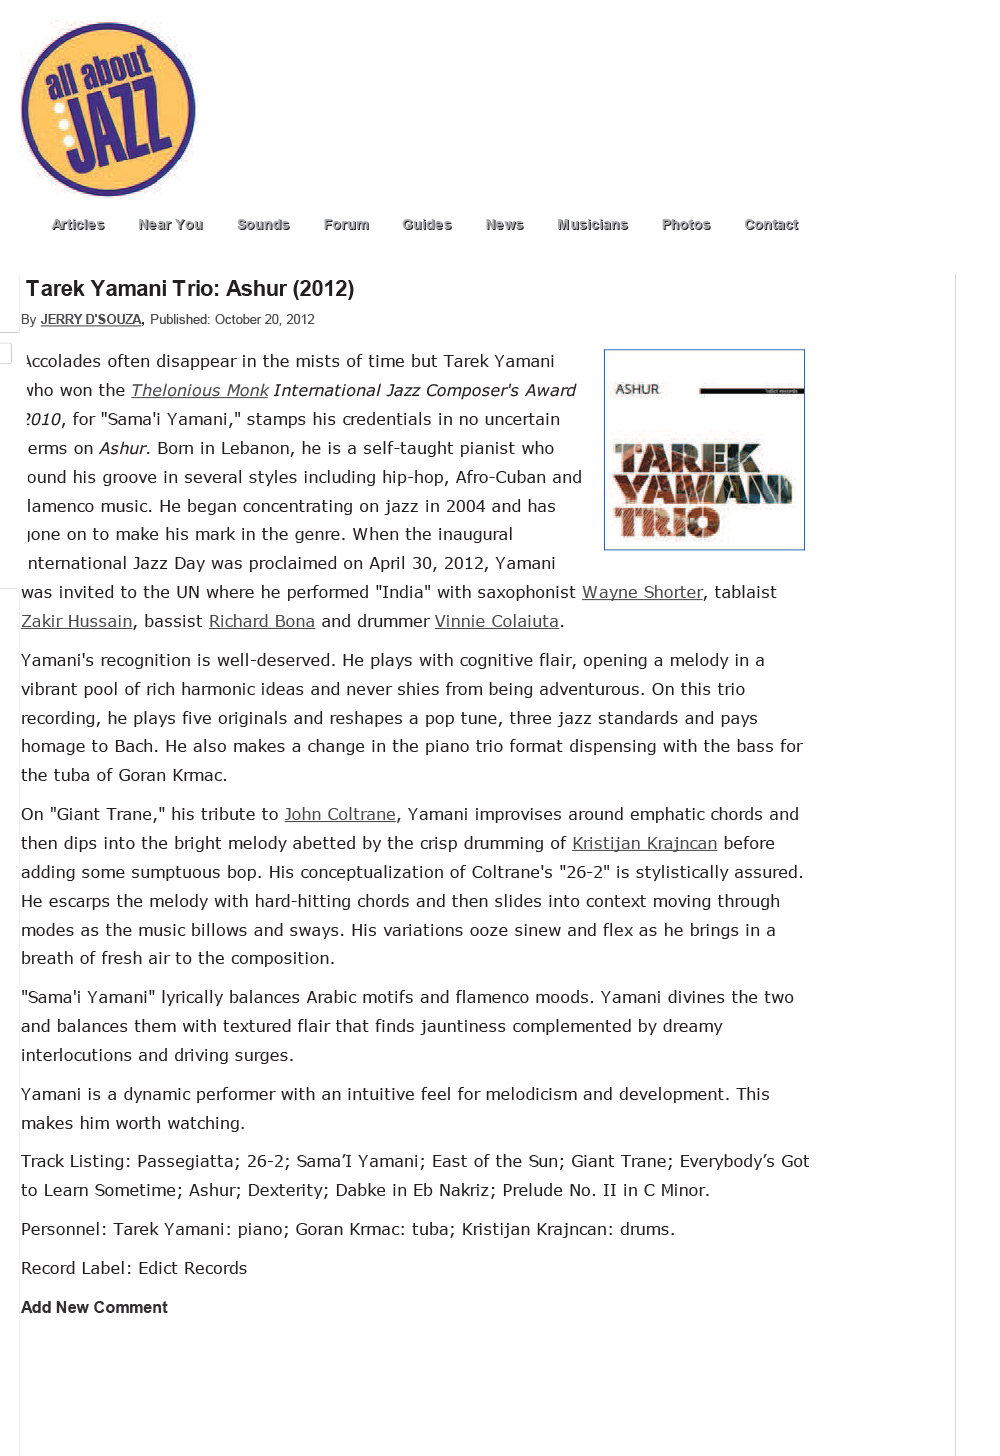 All About Jazz  / 20 OCT 2012 / Jerry D'Souza -  ASHUR Album Review